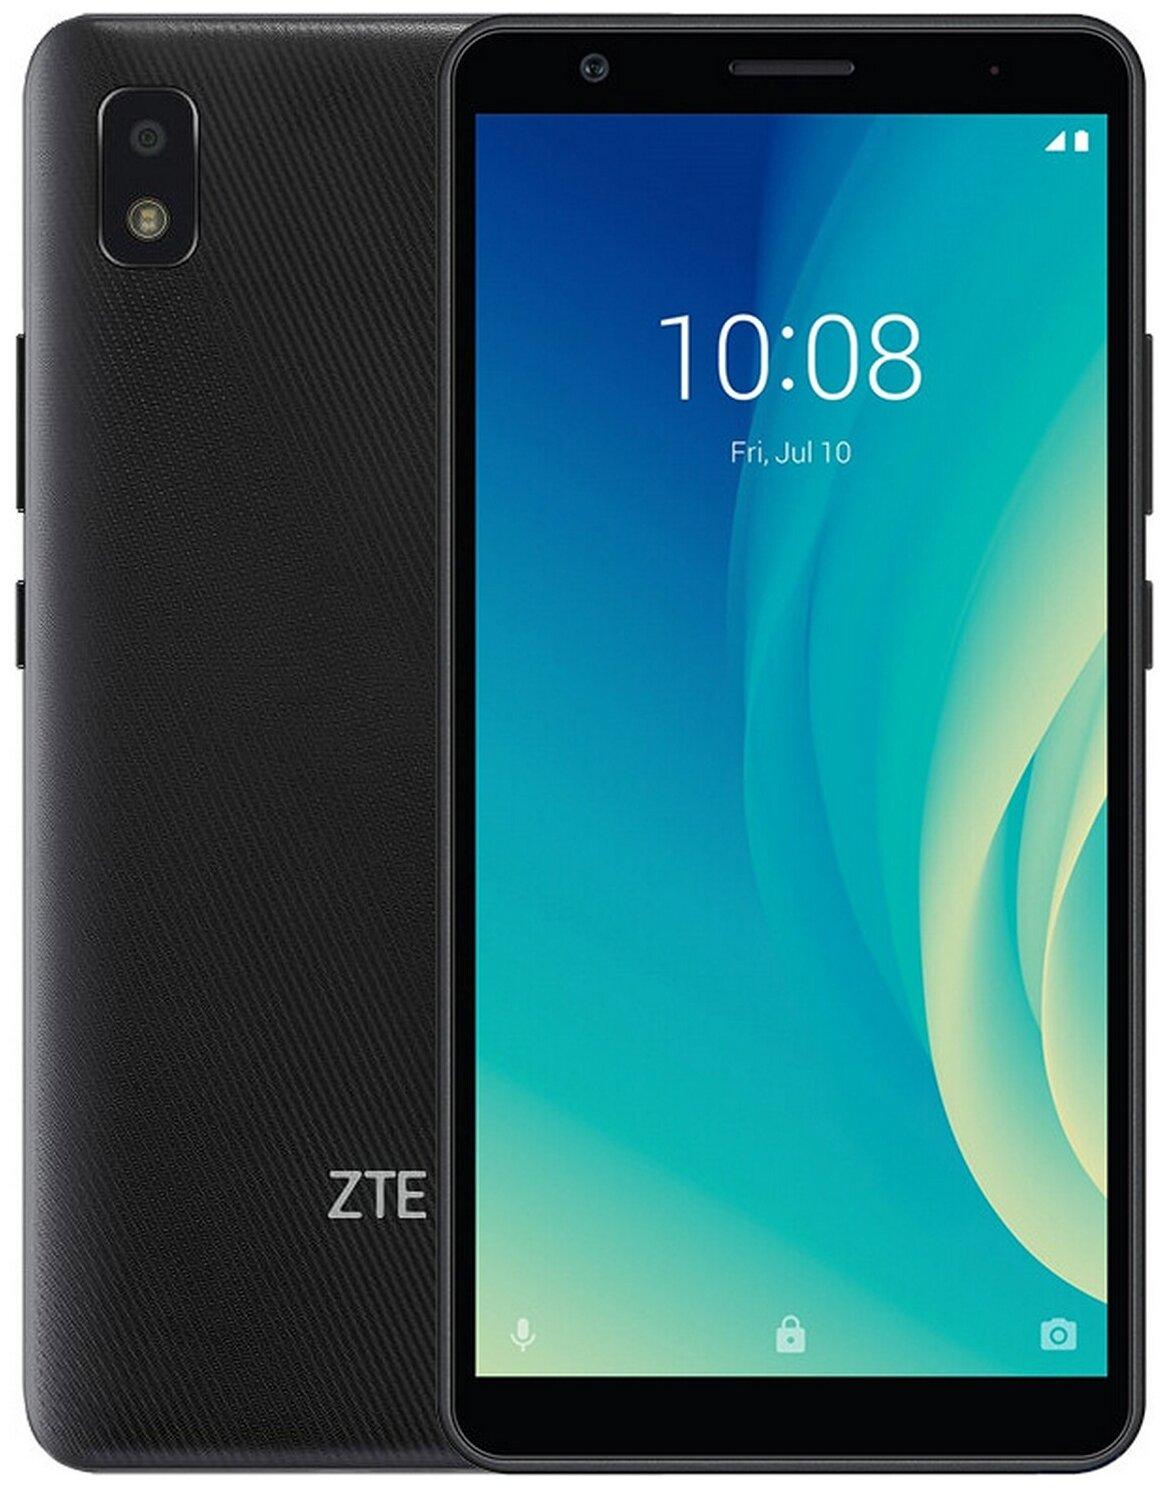 ZTE Blade L210 - беспроводные интерфейсы: Wi-Fi, Bluetooth 4.2